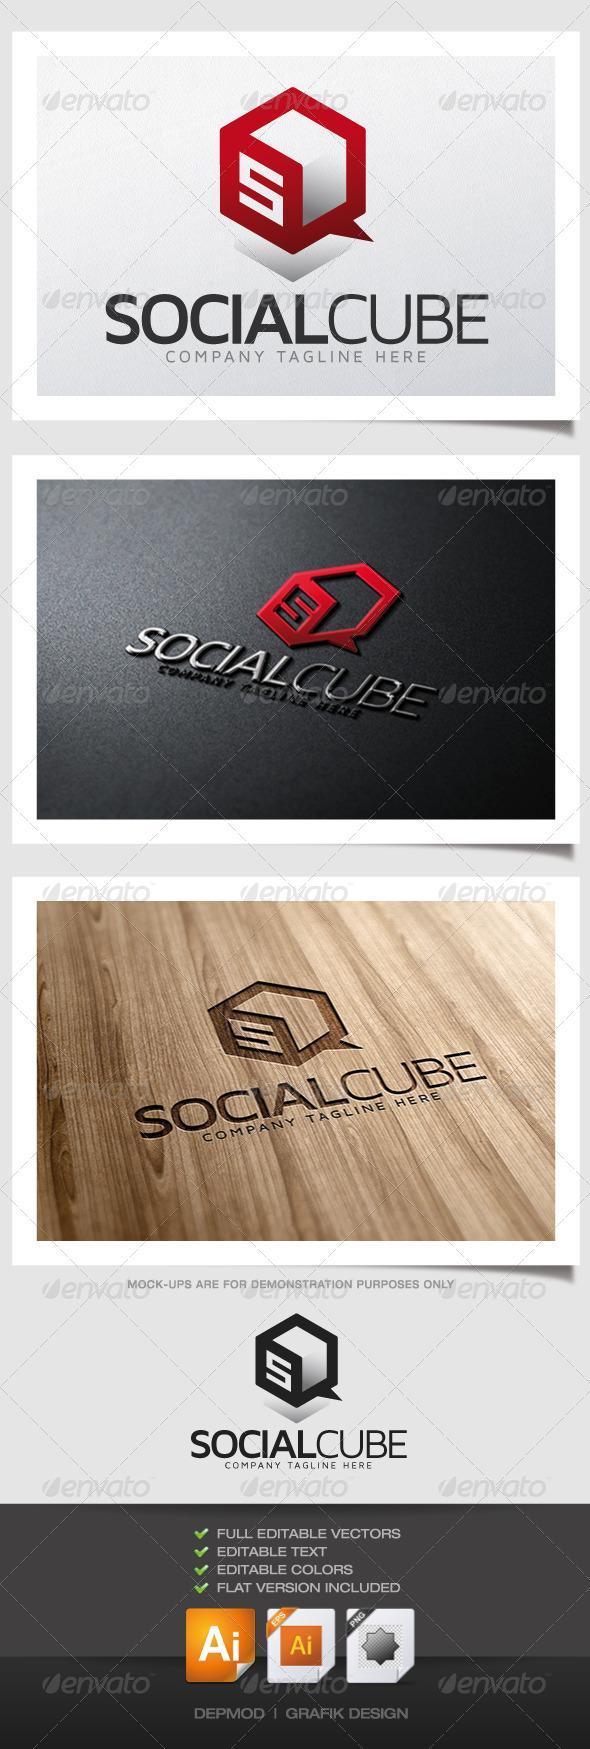 GraphicRiver Social Cube Logo 6184113